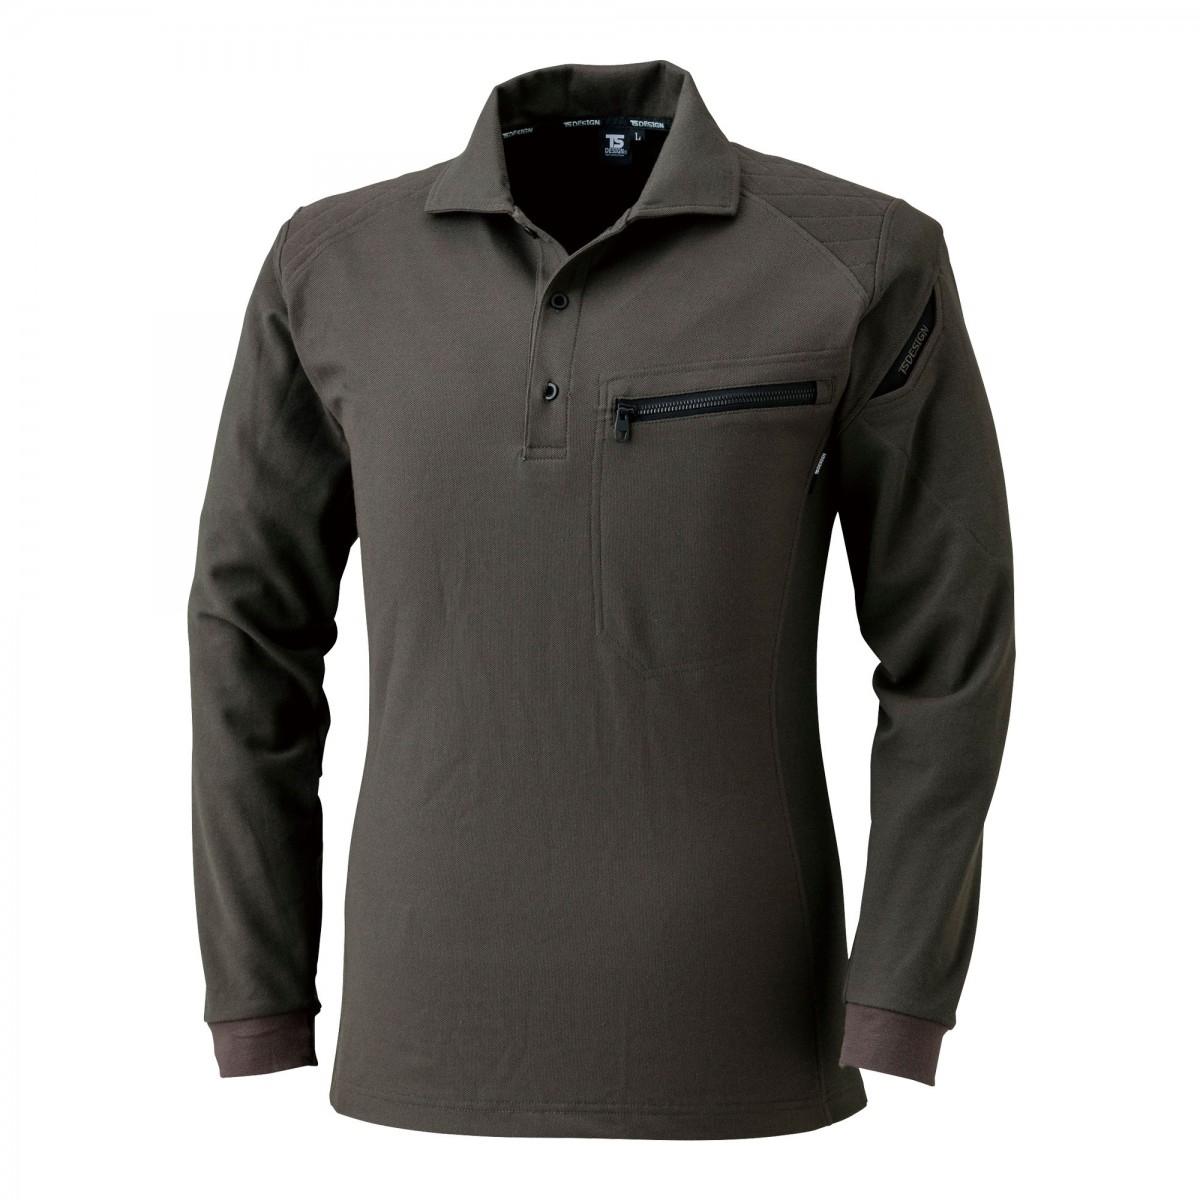 TS DESIGN~TSデザイン~5105 ワークニットロングポロシャツ 55 カーキ